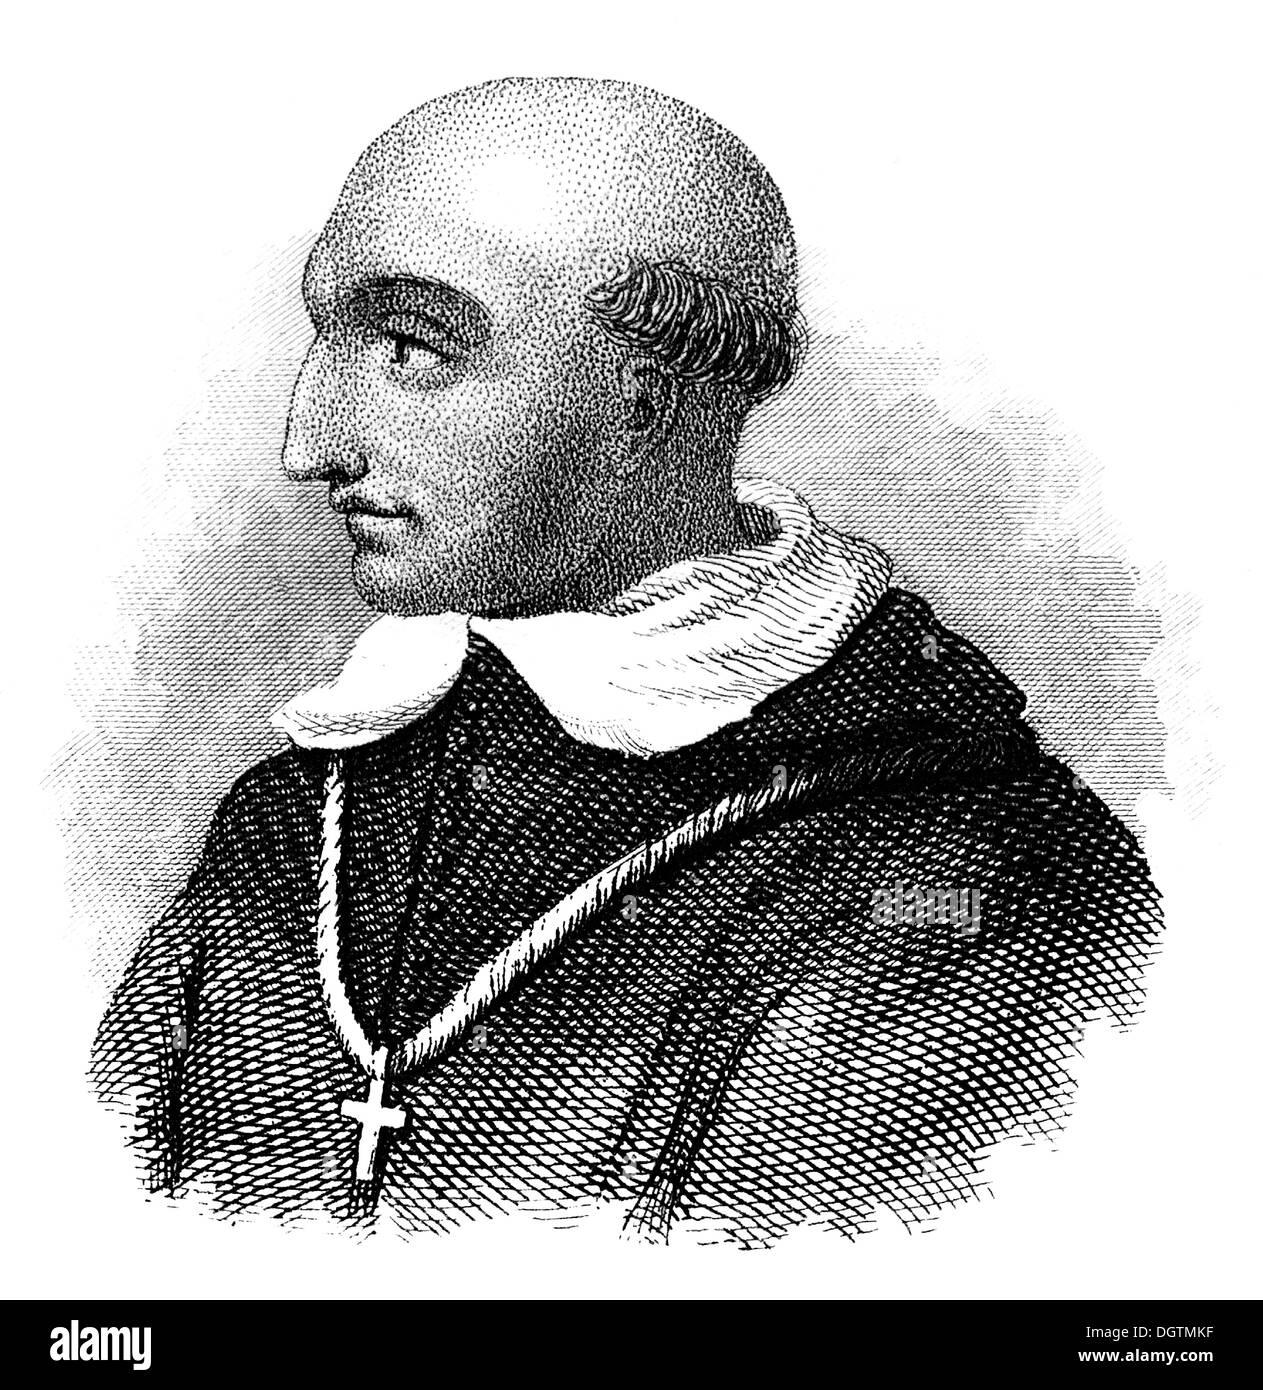 Bartolomé de las Casas, O.P., 1484 - 1566, a Spanish historian, social reformer and Dominican friar, Bishop of Chiapas - Stock Image